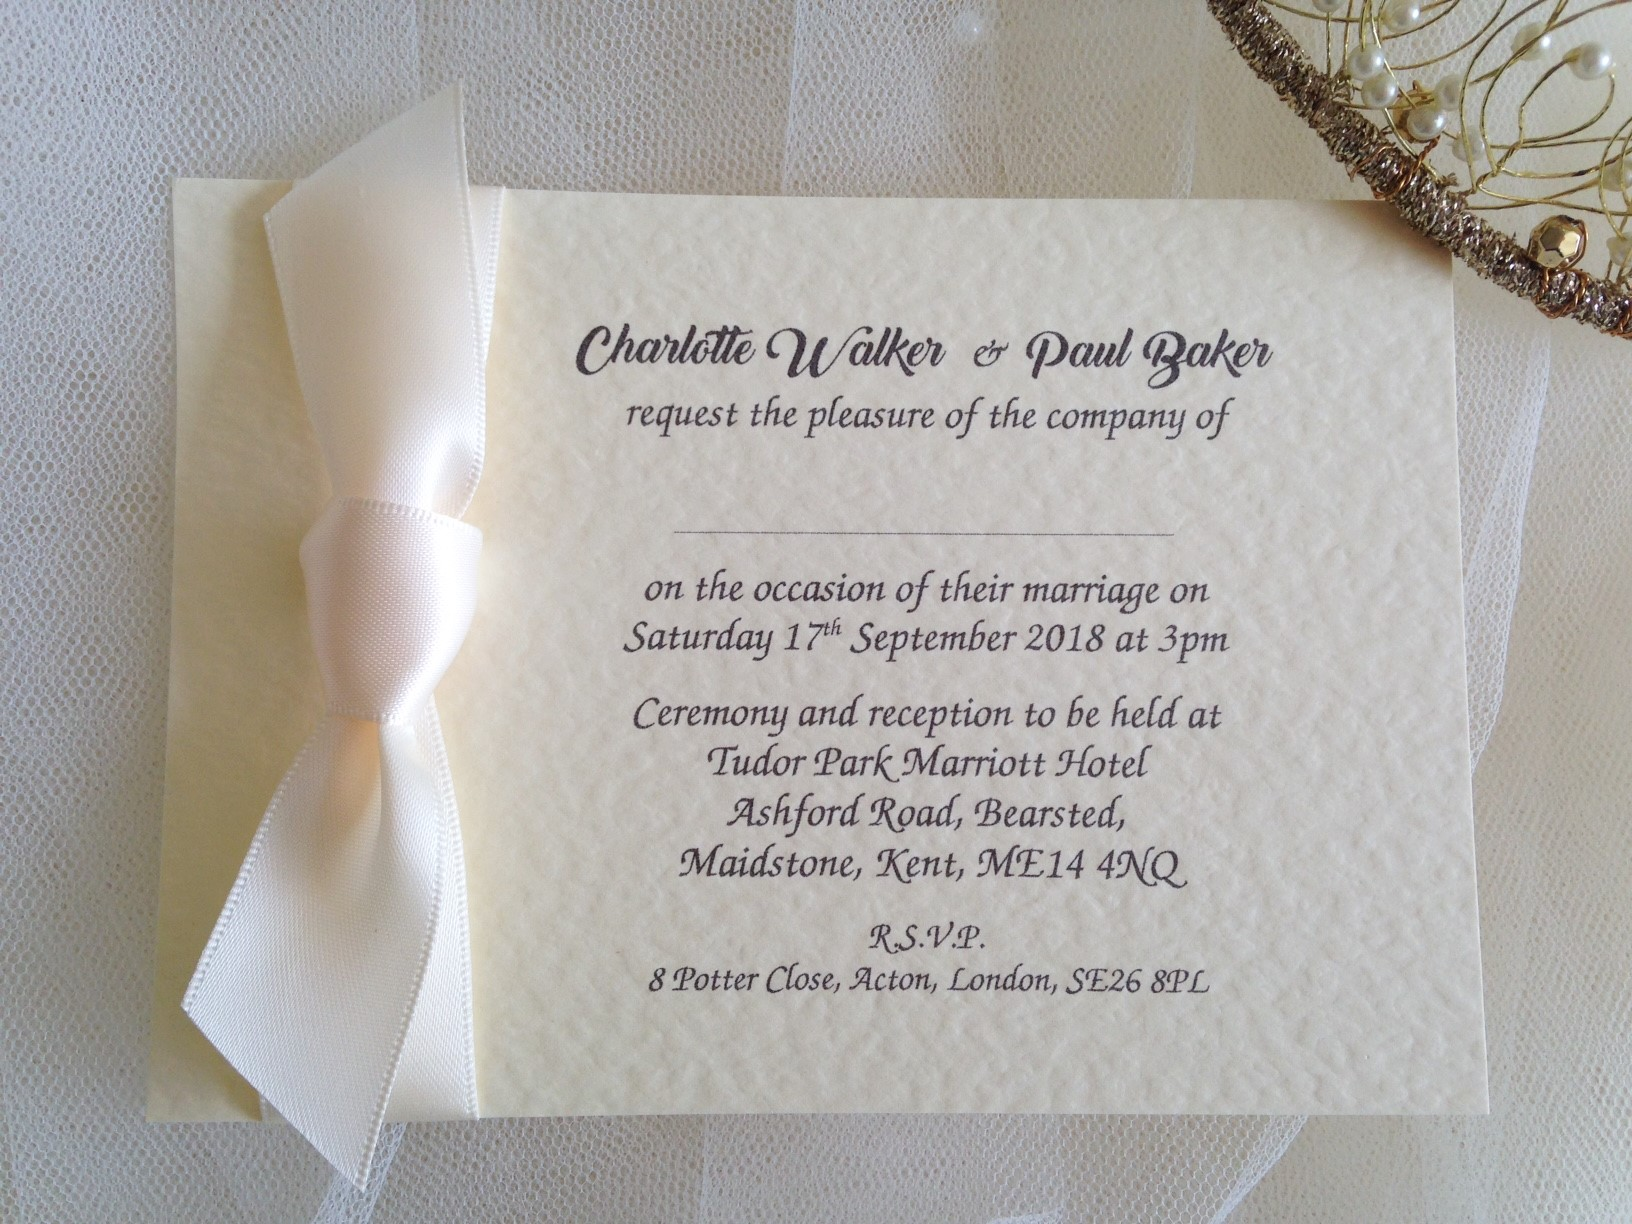 affordable wedding invites affordable wedding invitations wedding invitations 60p affordable wedding invitations uk single sided wedding invitations 4 wedding invitations